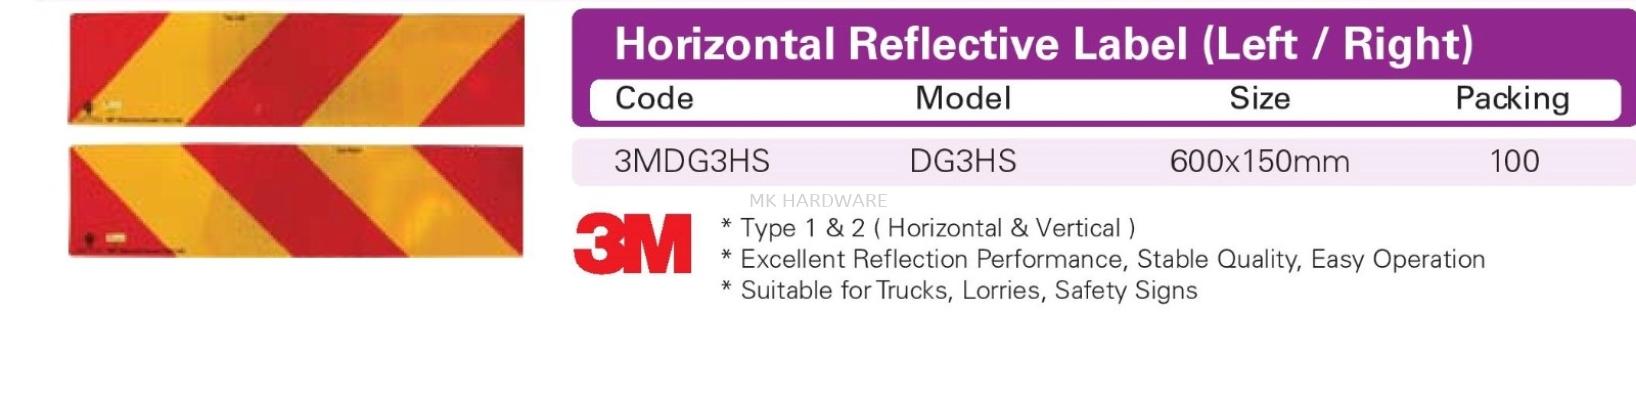 HORIZONTAL REFLECTIVE LABEL (RIGHT/LEFT)